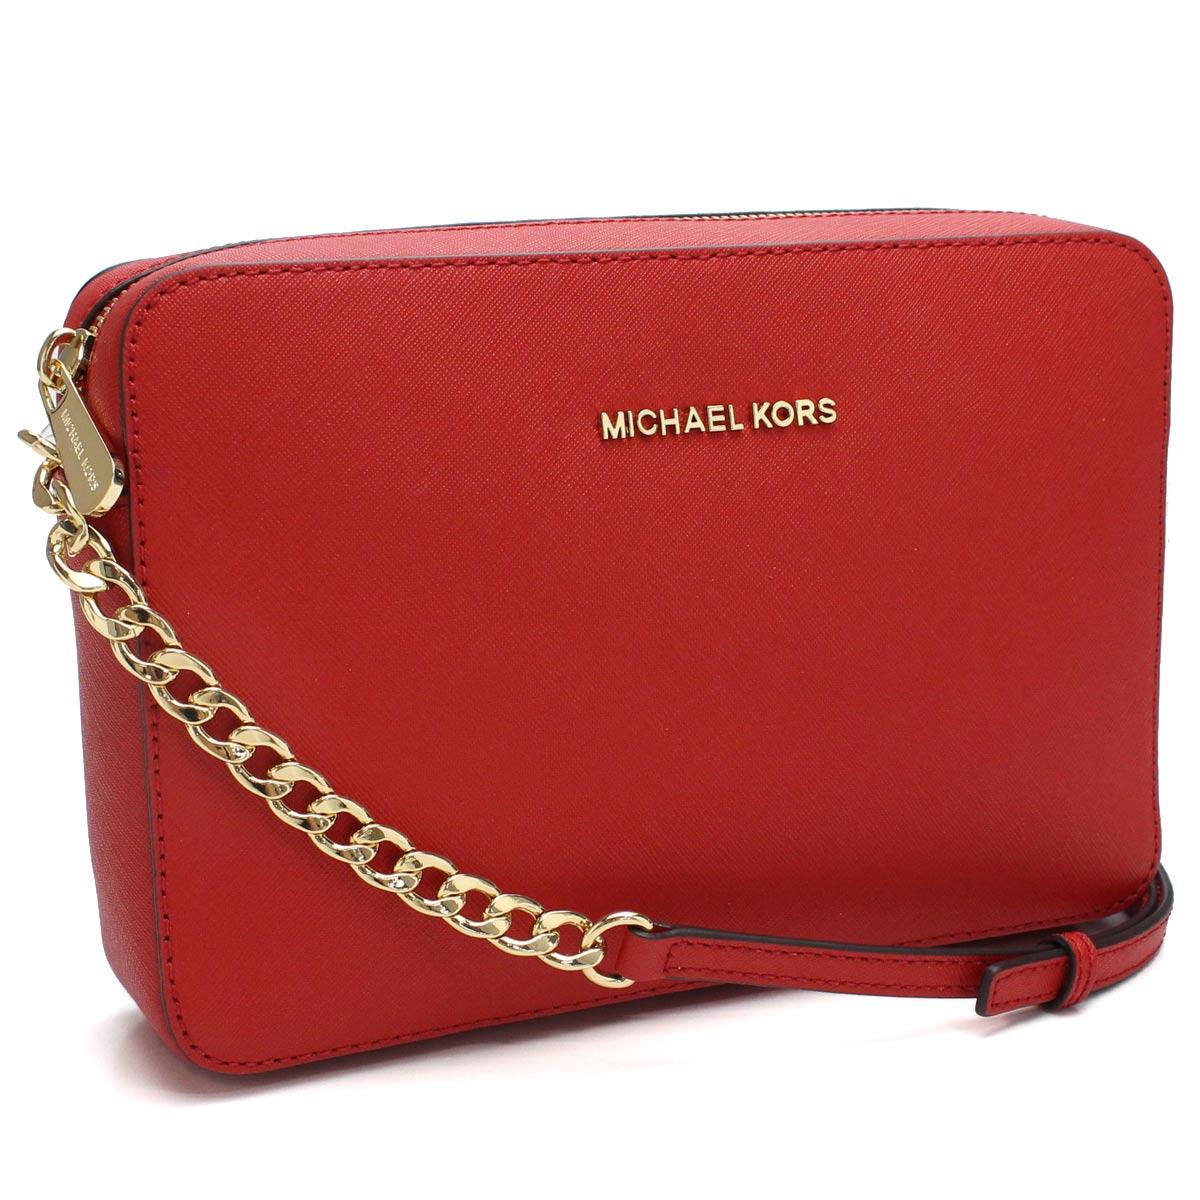 03ad574fcb66 Bighit The total brand wholesale: Take Michael Kors (MICHAEL KORS) JET SET  TRAVEL jet set travel slant; shoulder bag 32S4GTVC3L BRIGHT RED red system  ...